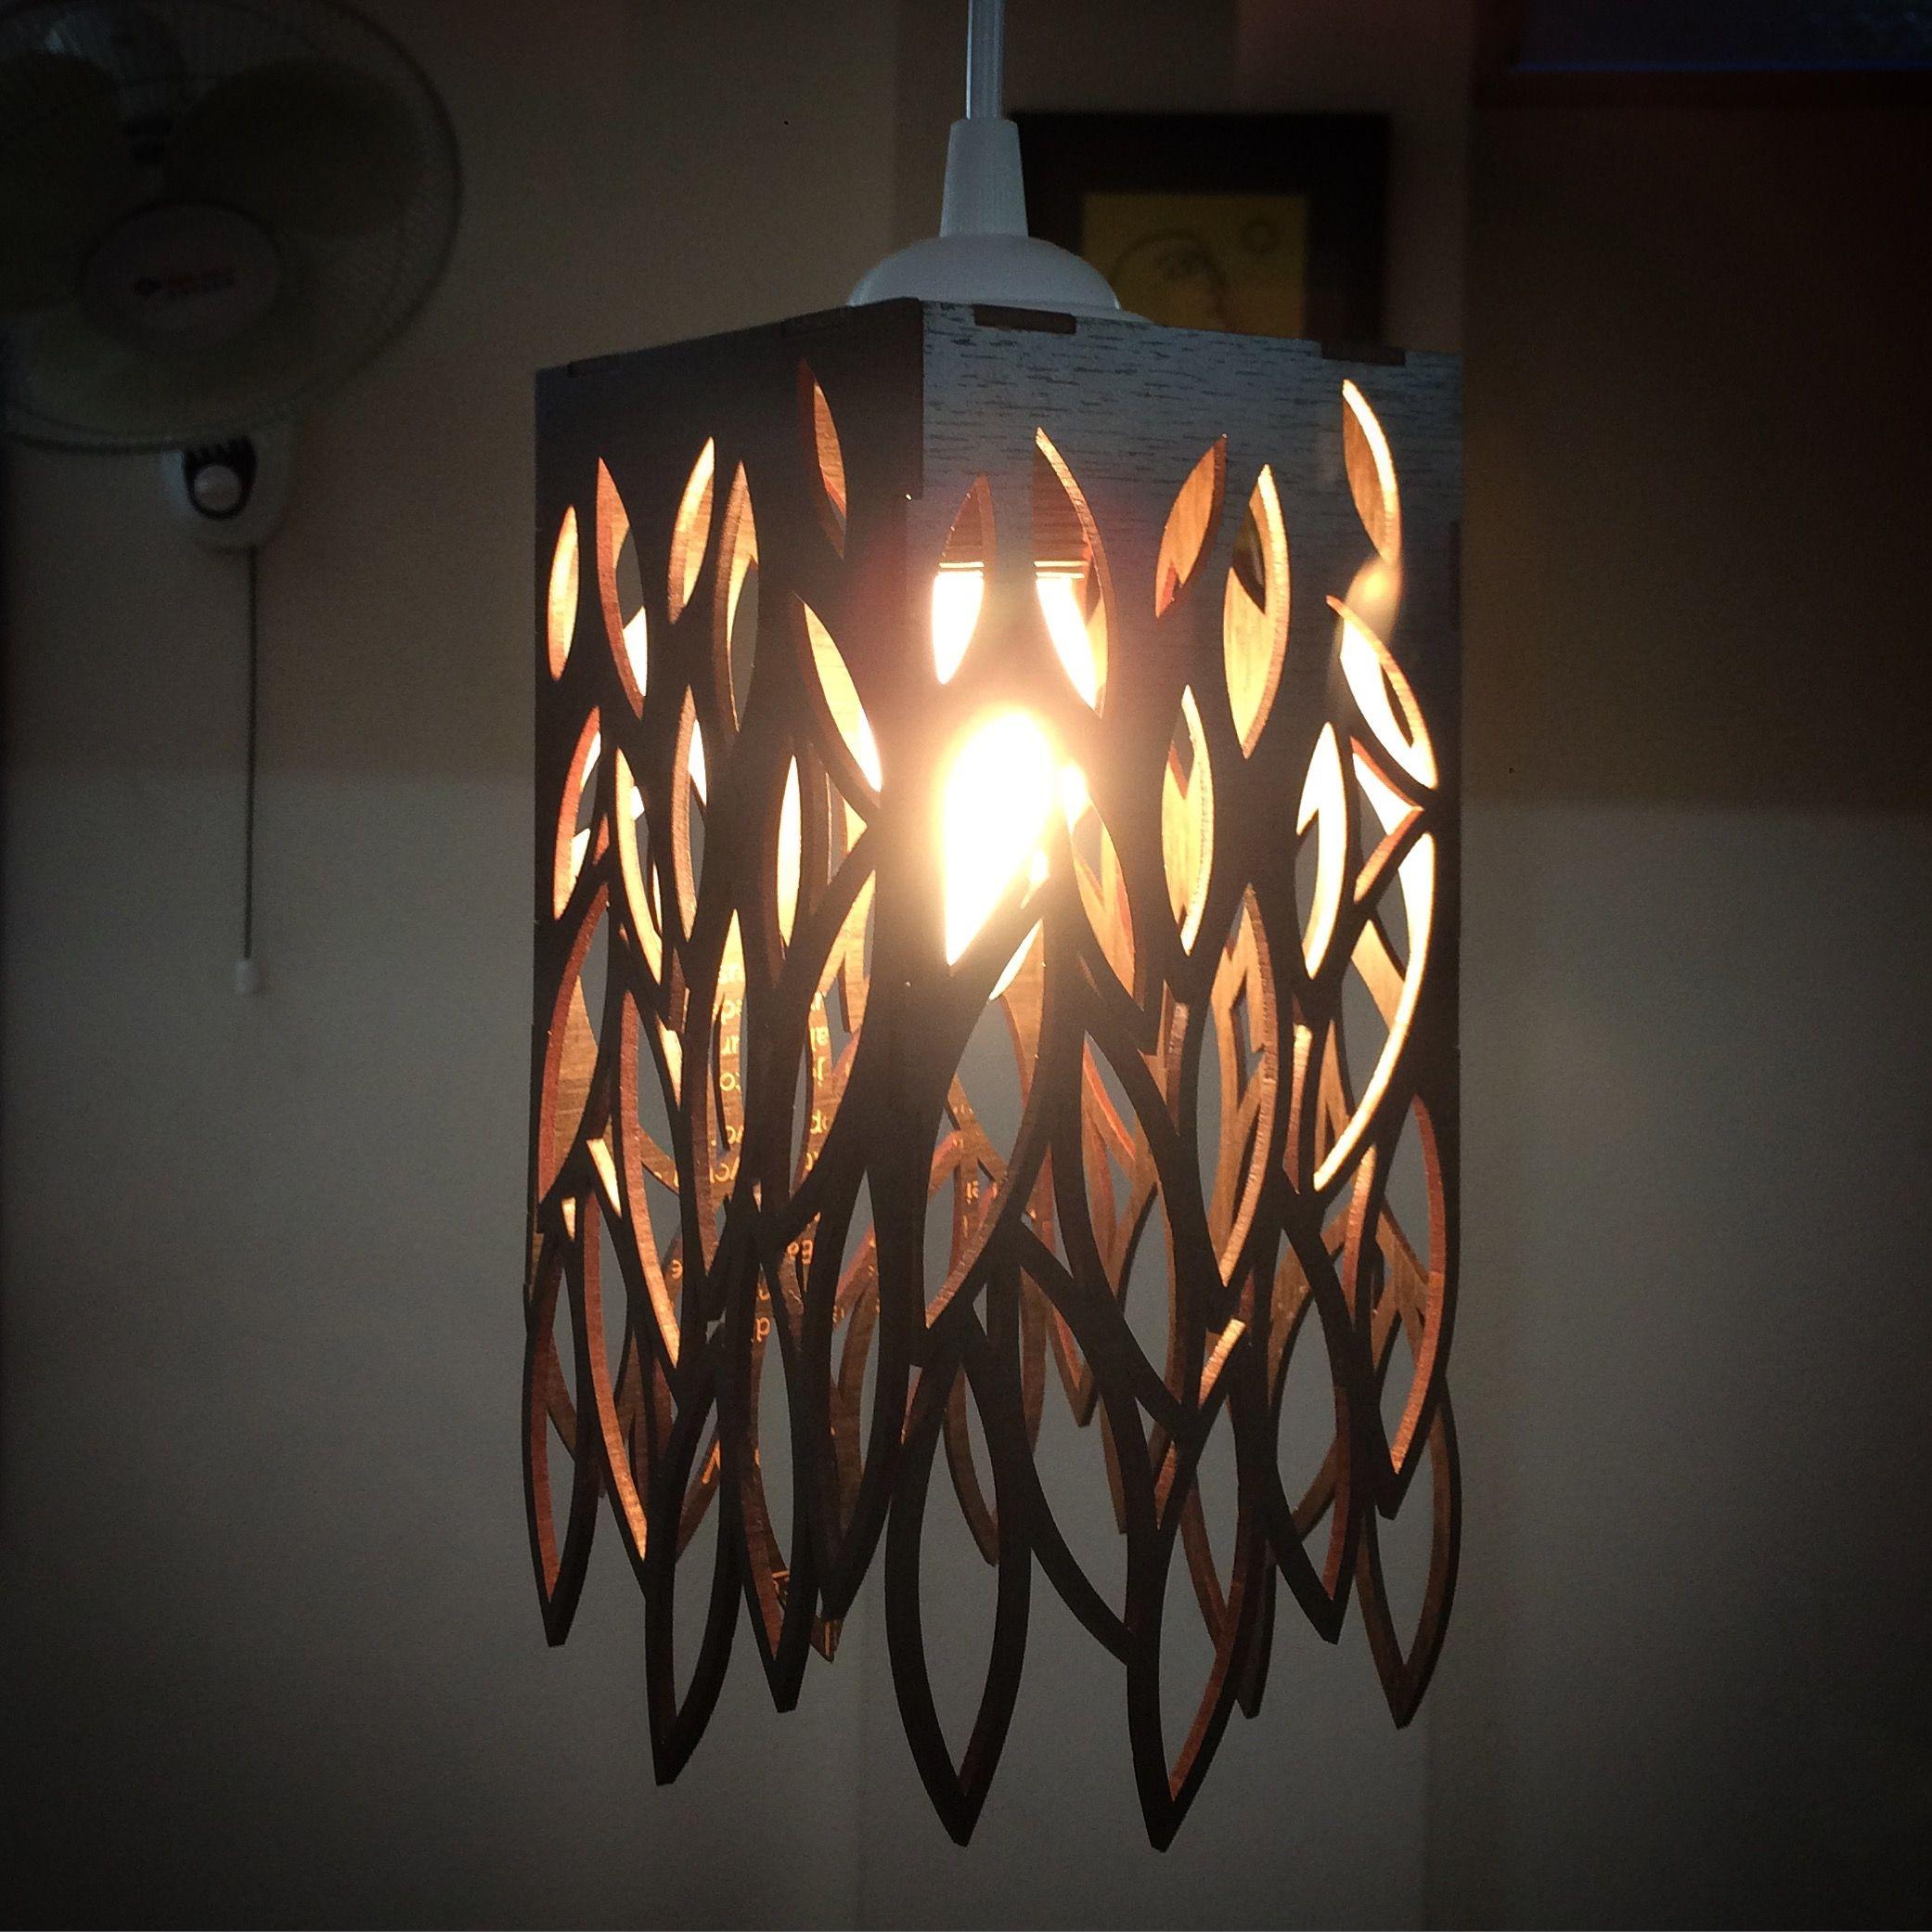 Laser Cut Lamps Cnc Wood Cutting Plasma Lighting Design Ideas Machine Metal Art Working